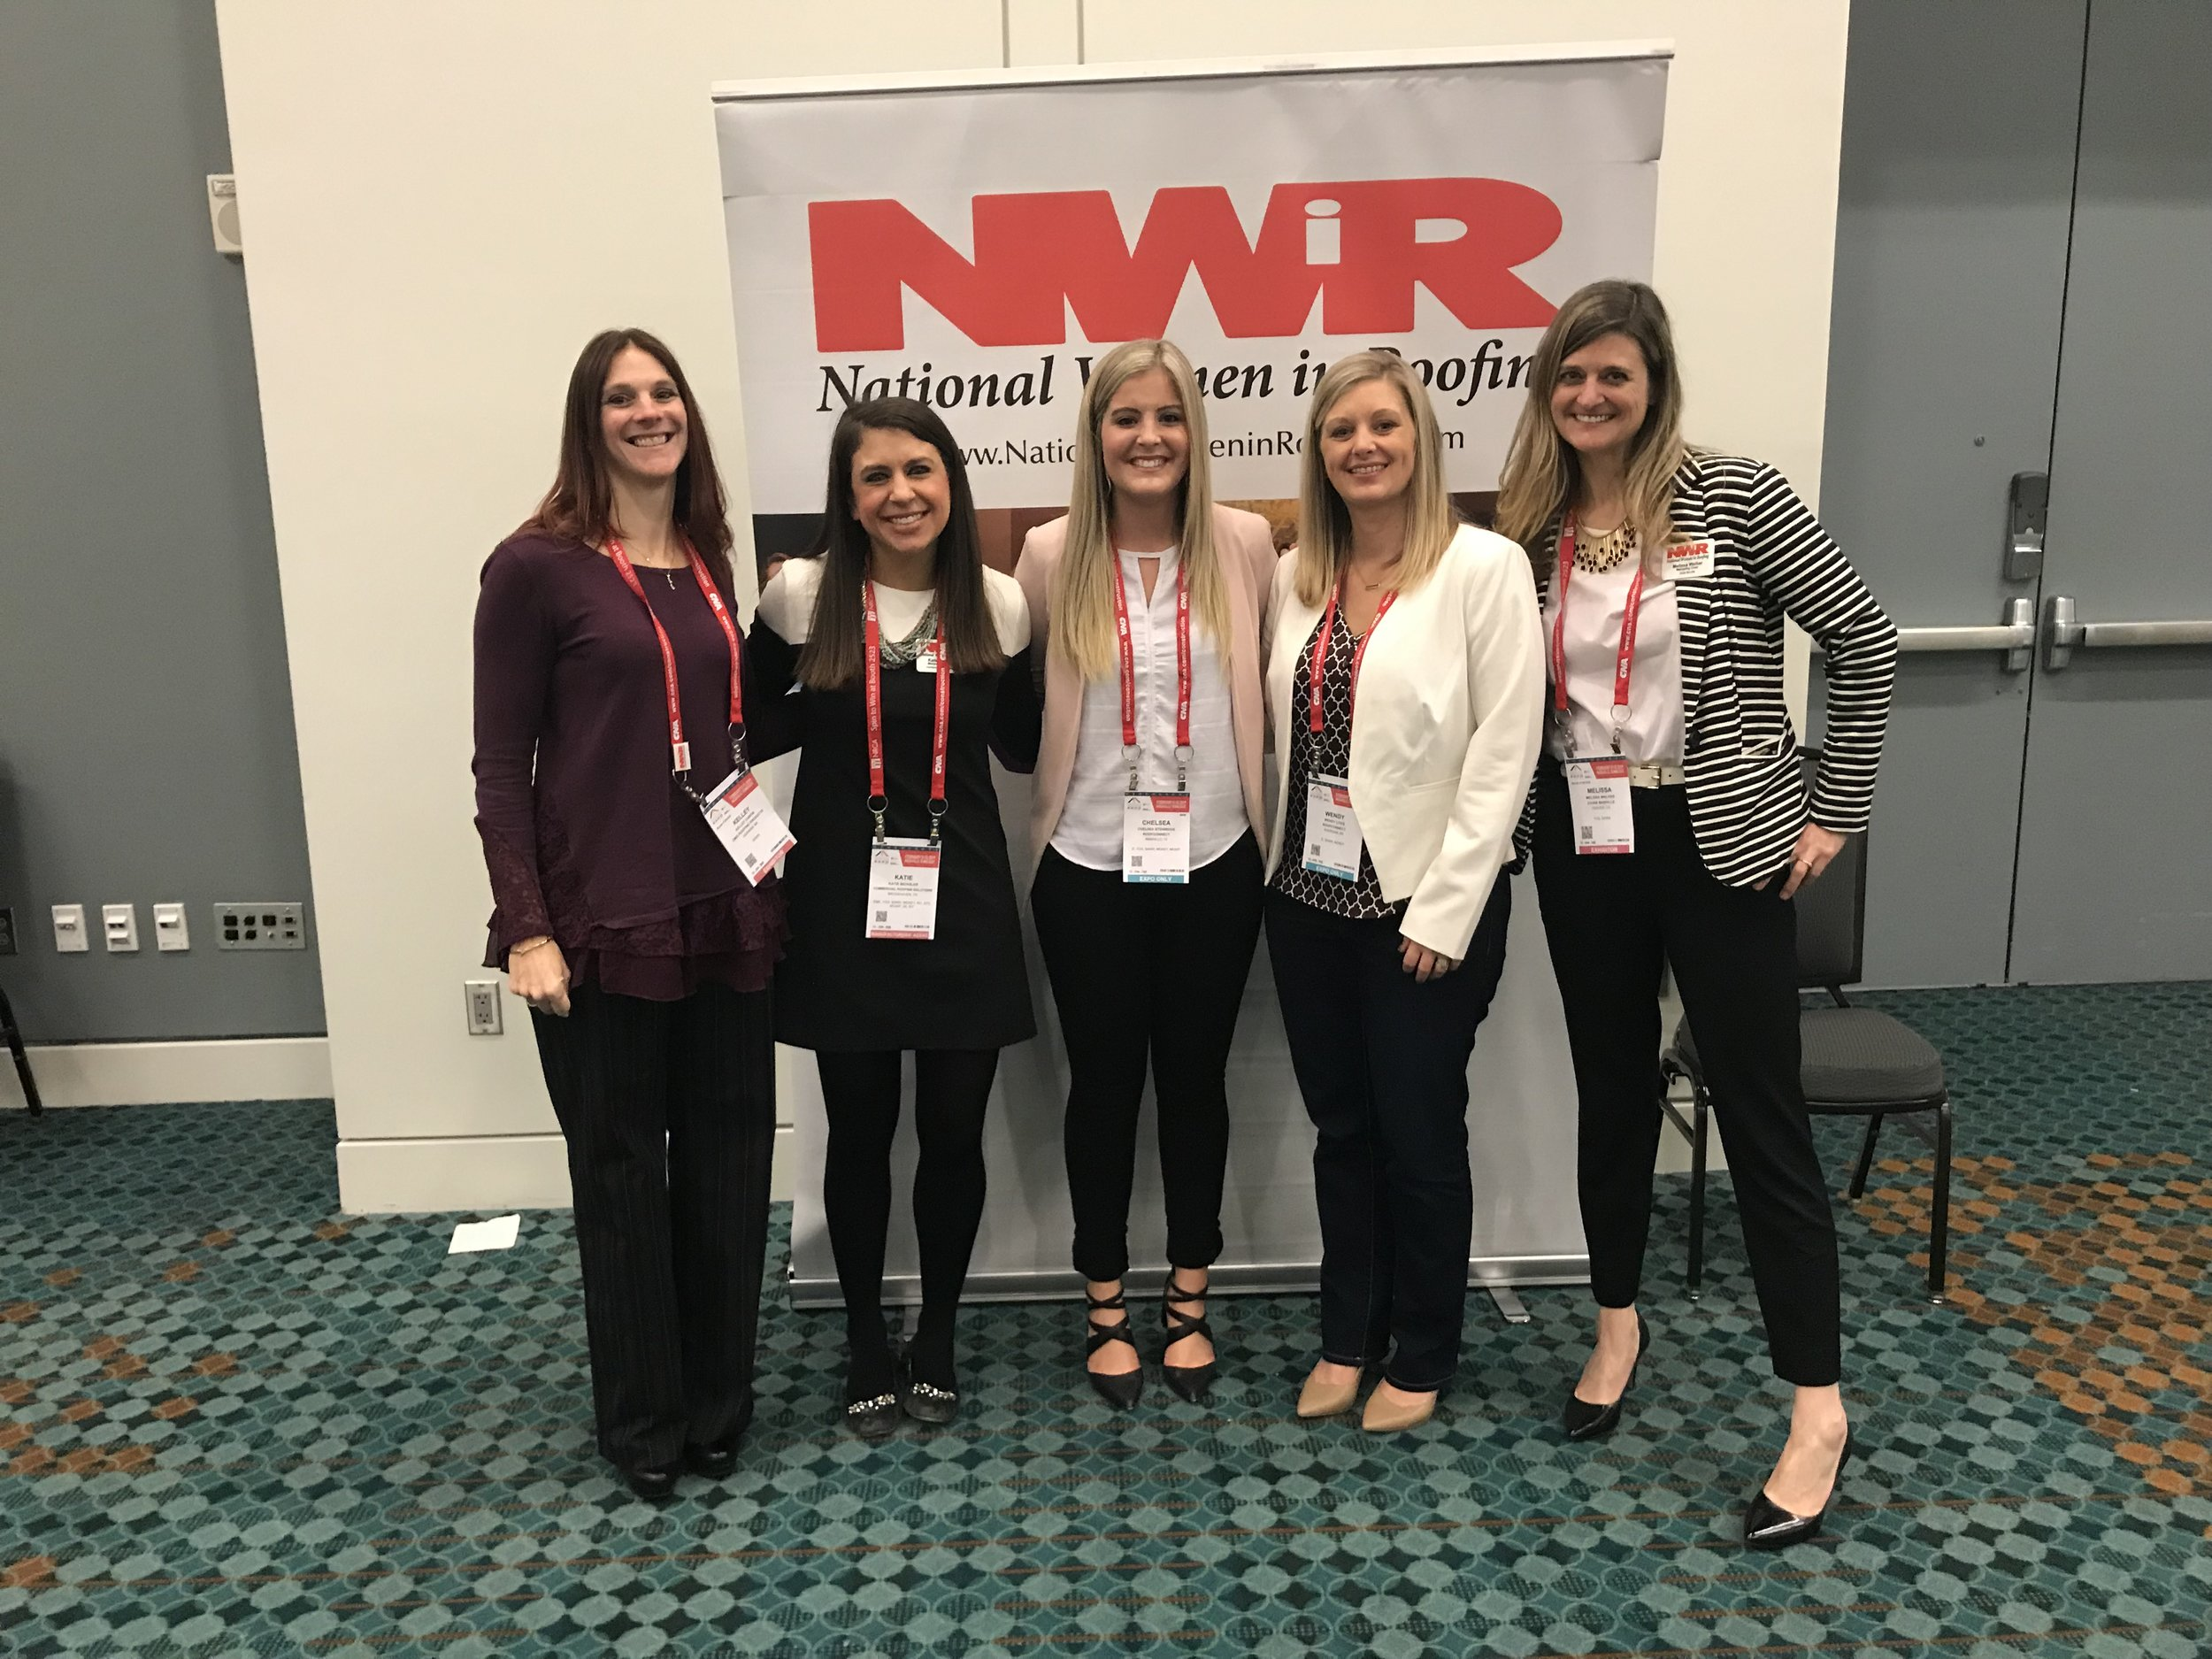 NWIR 2019 Mentorship Commitee - From left to right:Kelley Caron, Katie Bicksler, Chelsea Steinbock, Wendy Lites, Melissa Walker